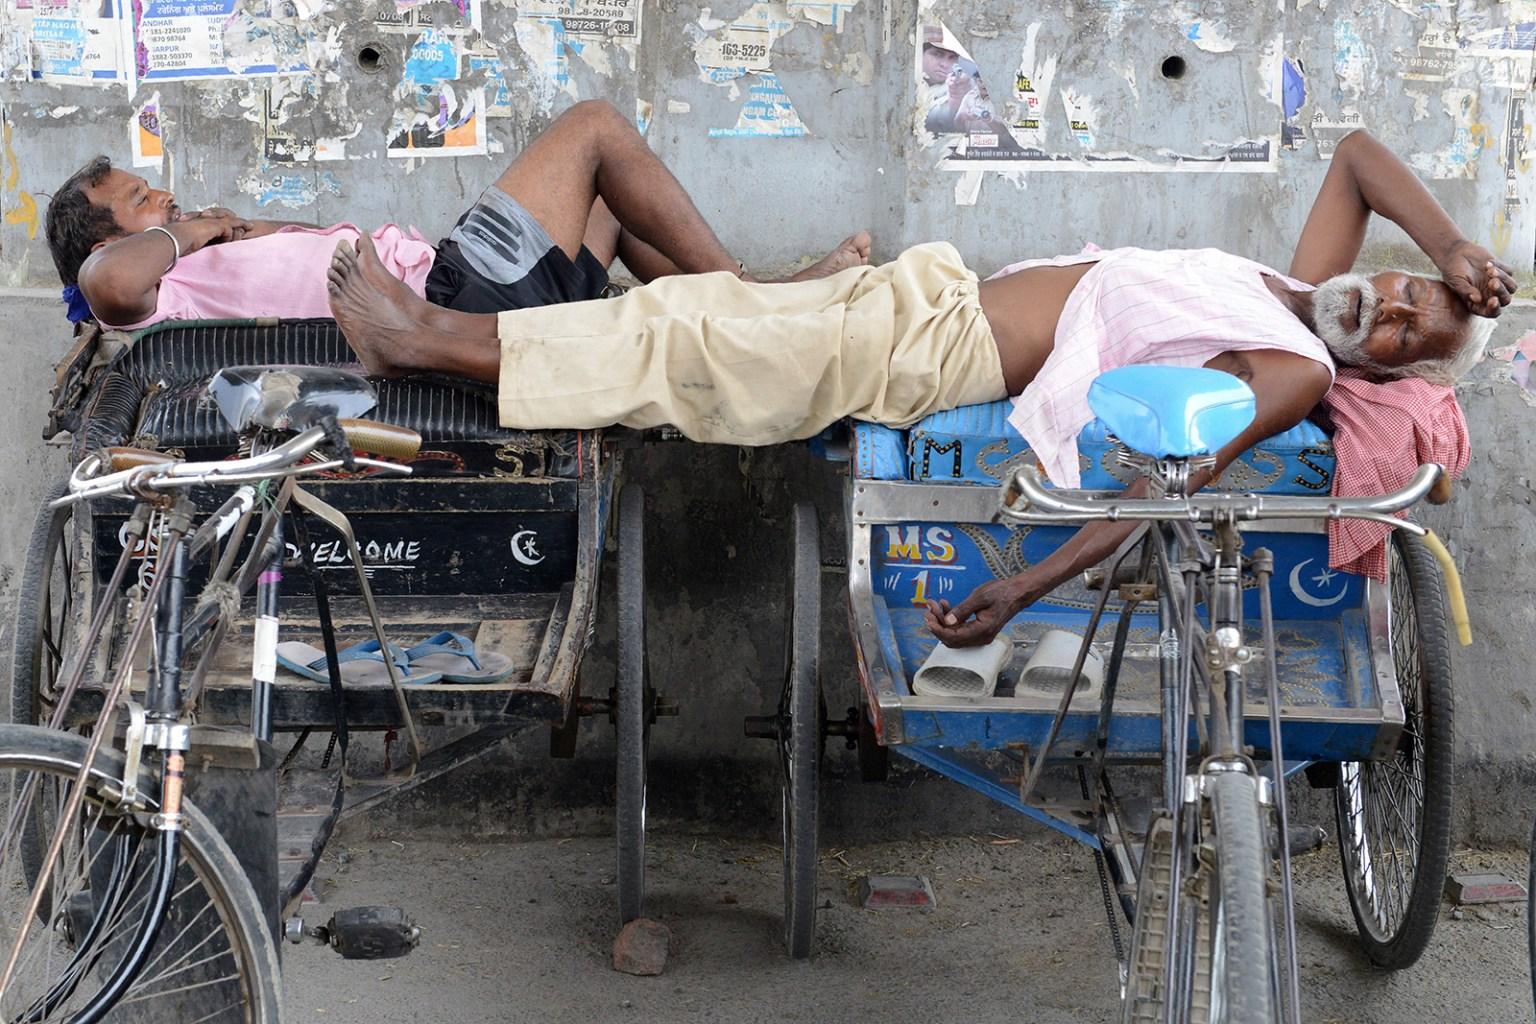 Indian cycle rickshaw drivers take a nap under a flyover bridge during a hot summer day in Amritsar, India, on July 3. NARINDER NANU/AFP/Getty Images